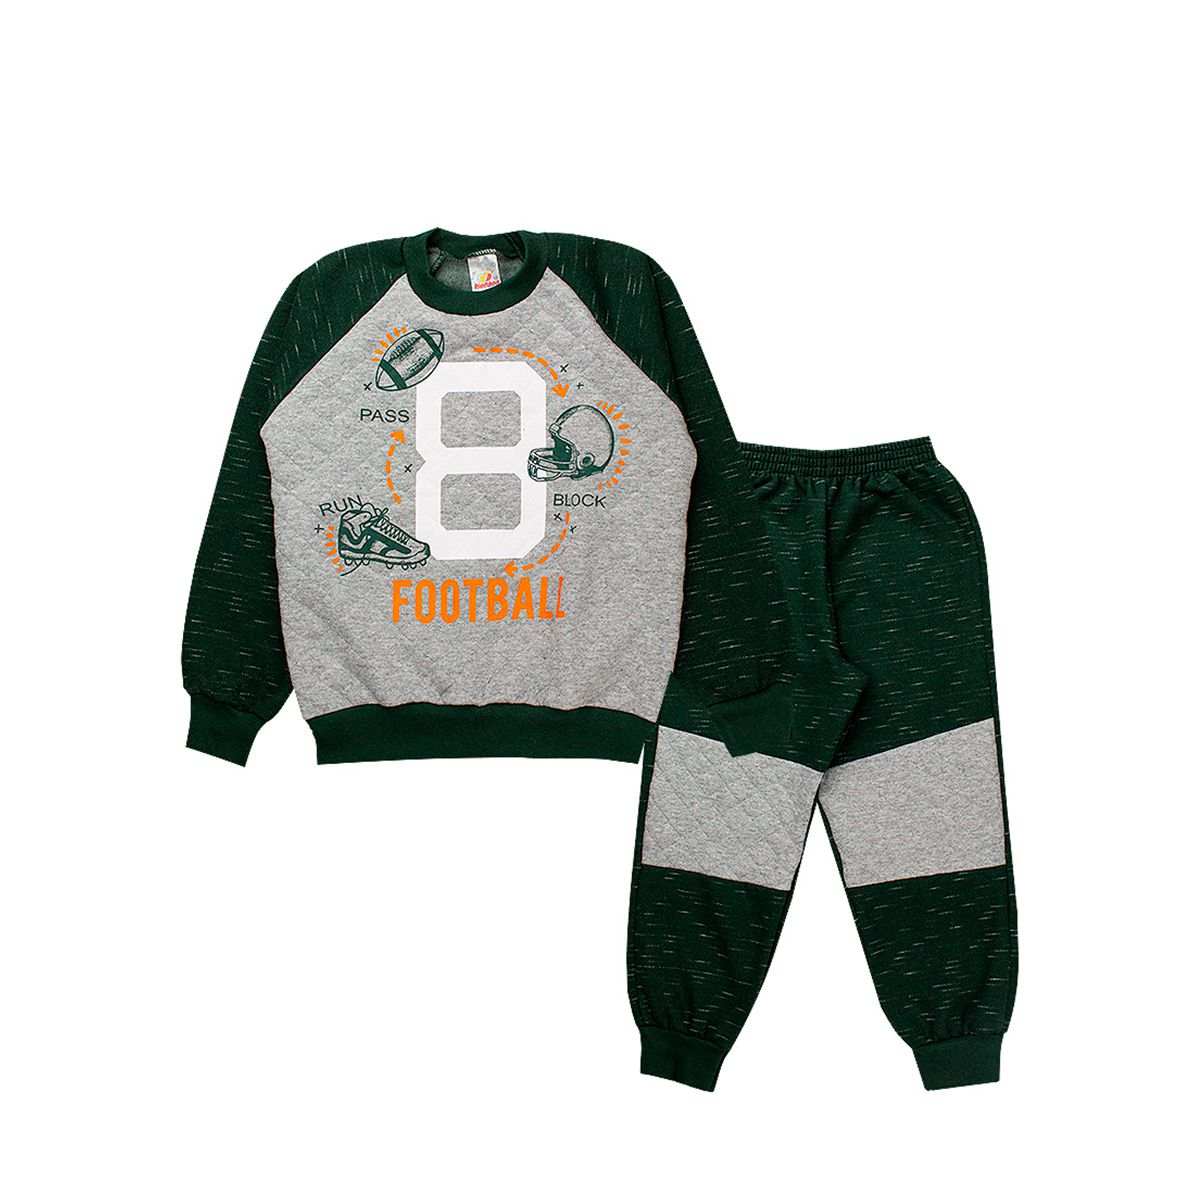 Conjunto de Moletom Infantil Masculino Verde Militar Isensee